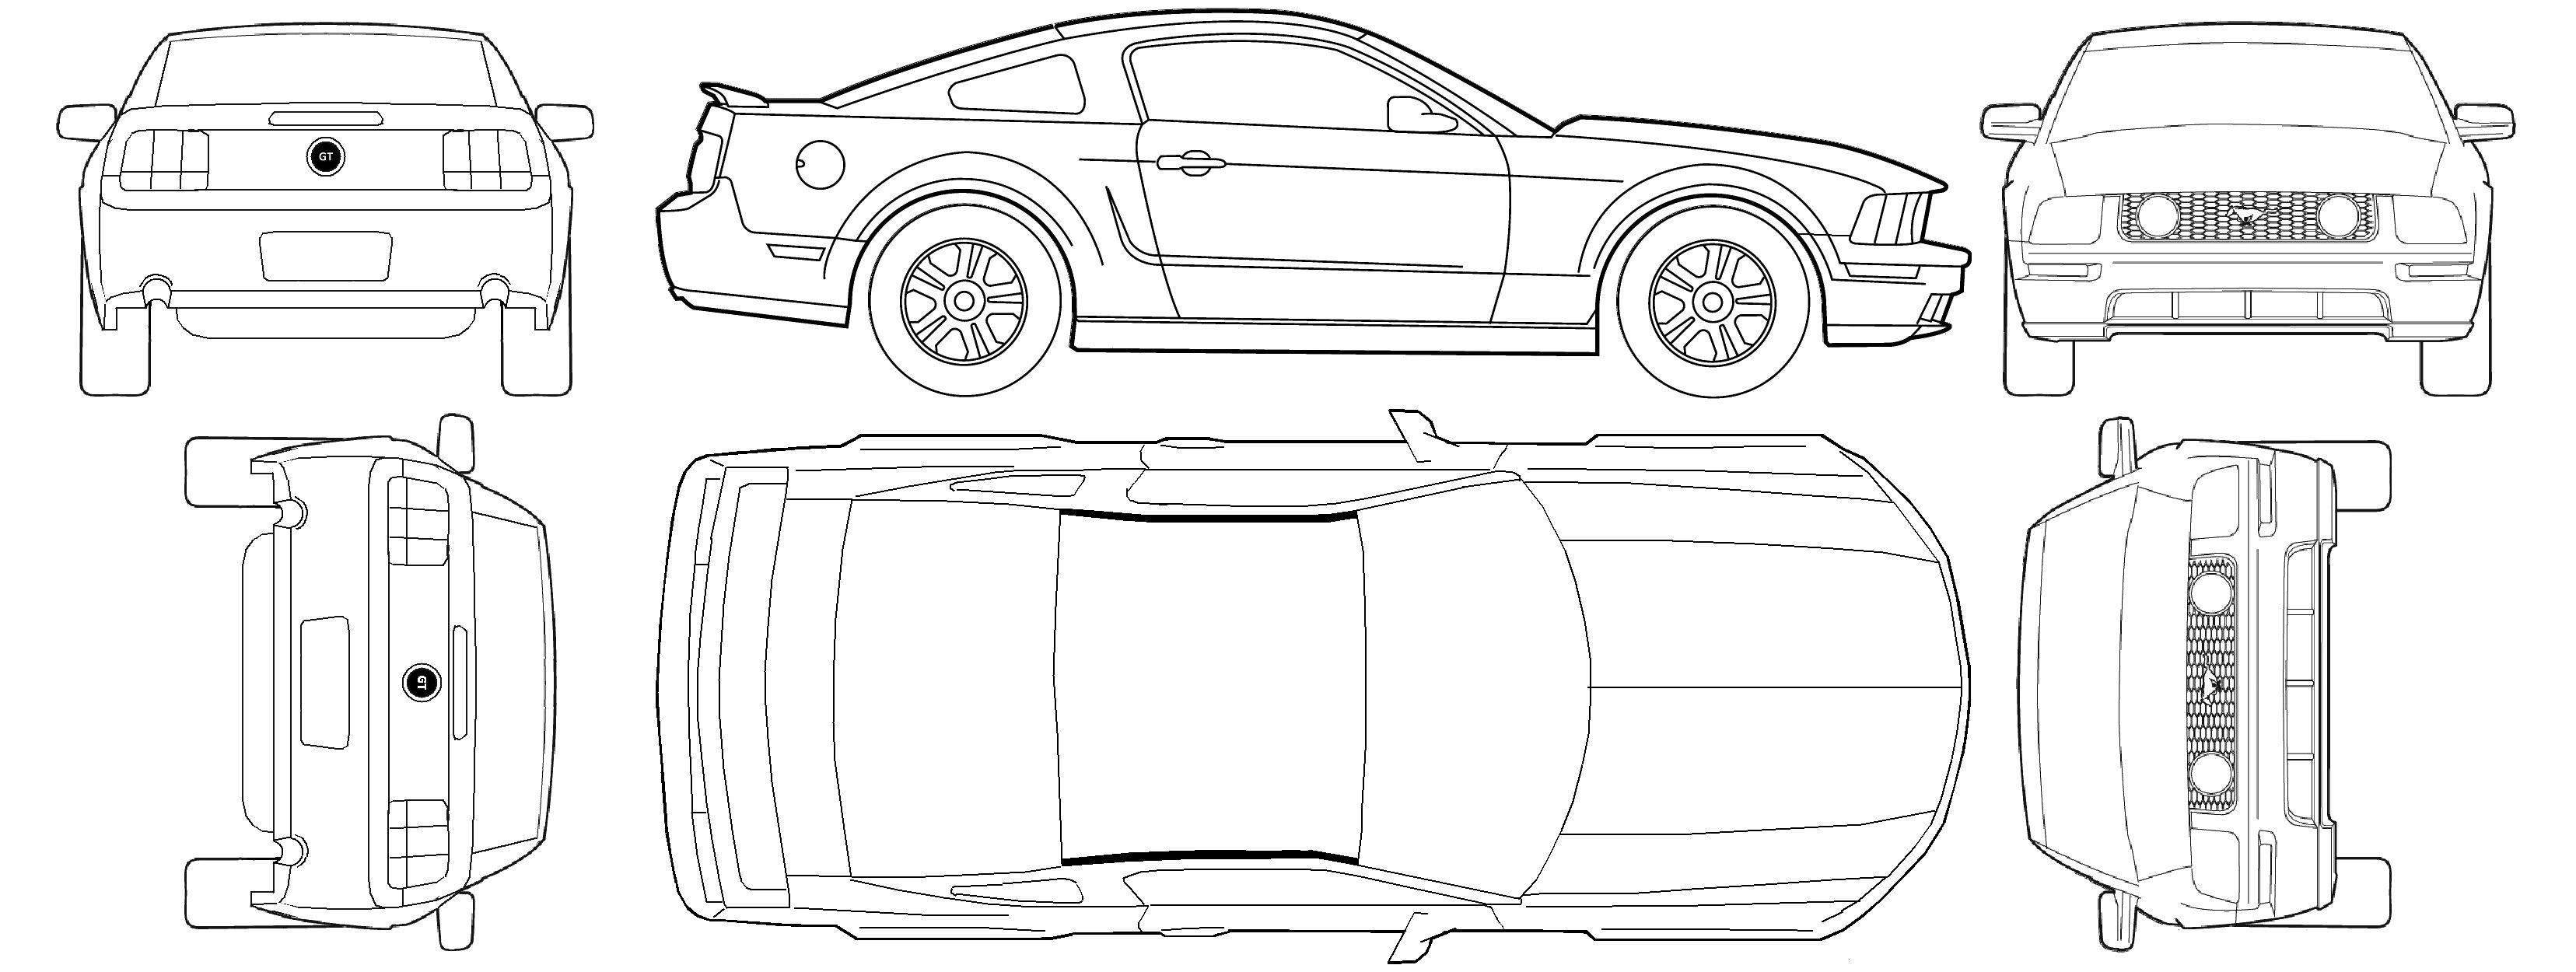 Free Car Blueprint Ford Mustang Gt V8